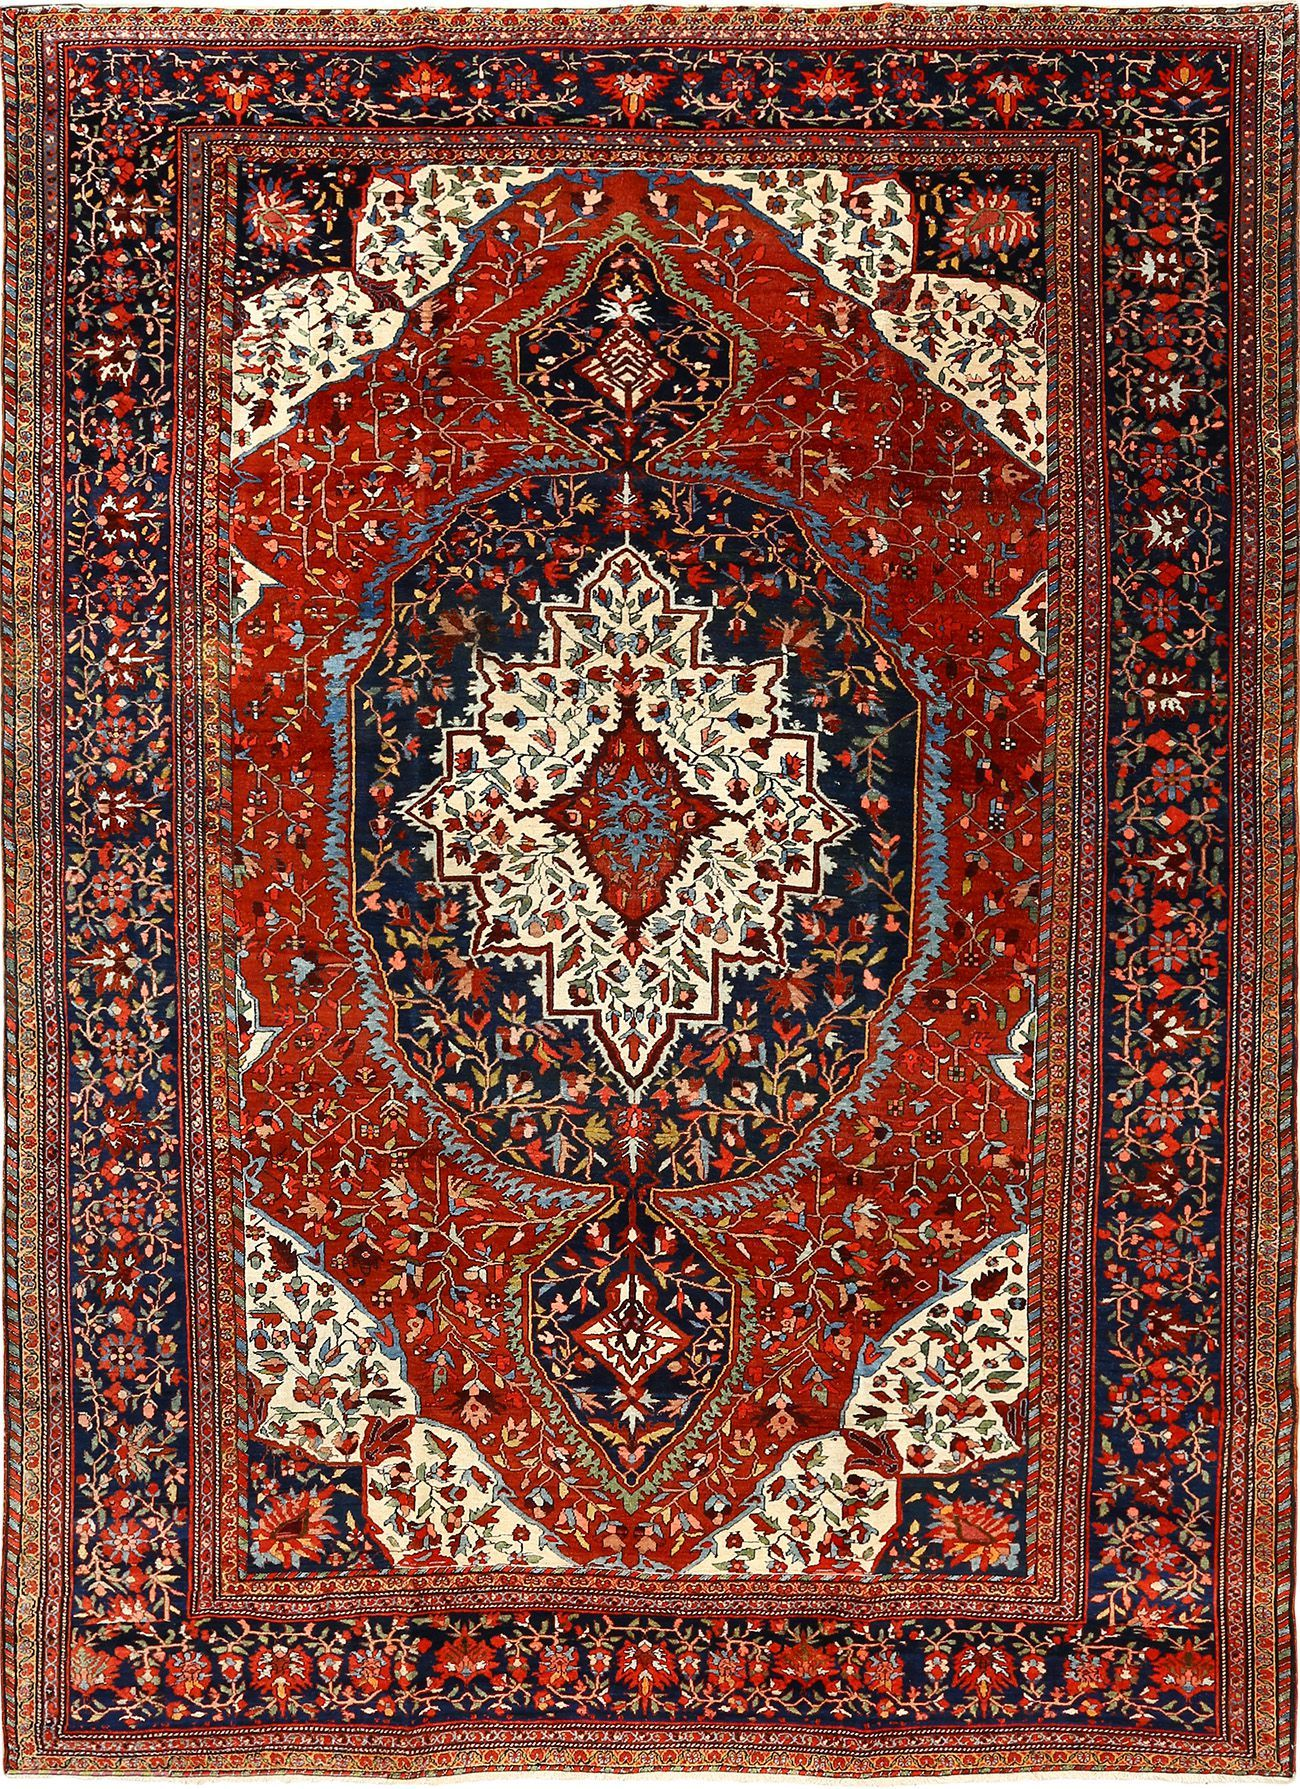 Antique Red Background Sarouk Farahan Persian Rug 51095 Persian Rug Antique Persian Rug Rugs